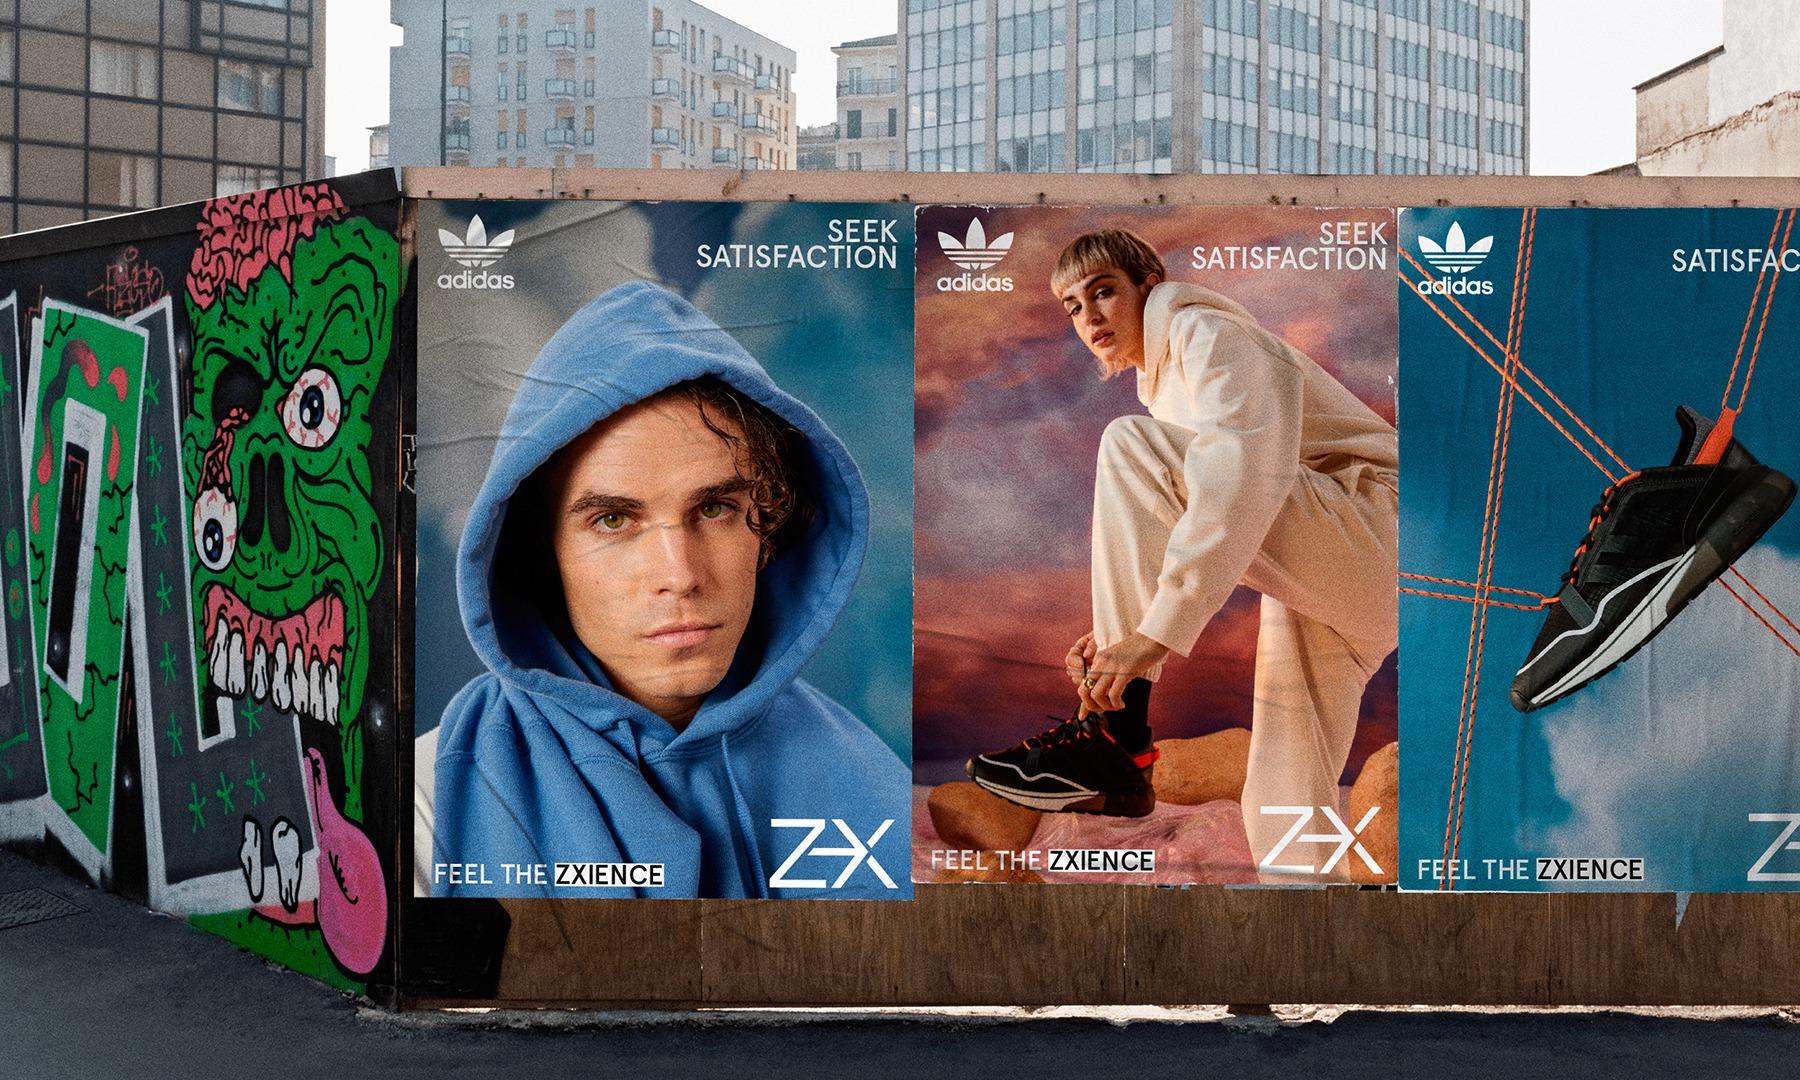 adidas-zx-studiobruma16